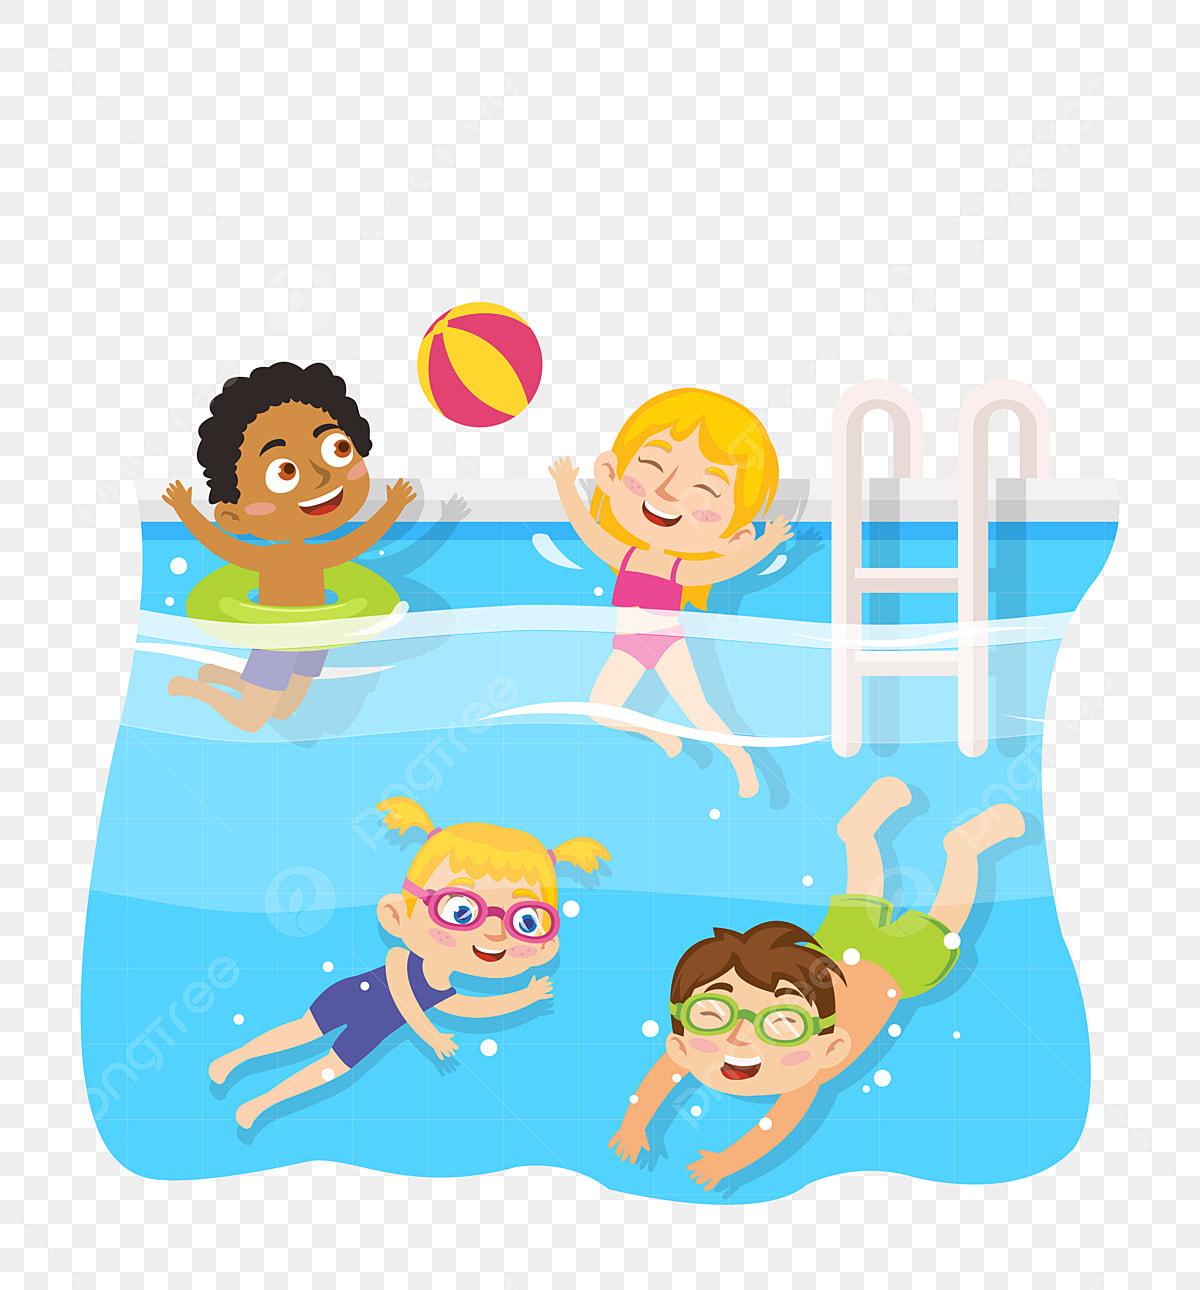 Kid Swimming Pool Children Swimming Learning To Swim